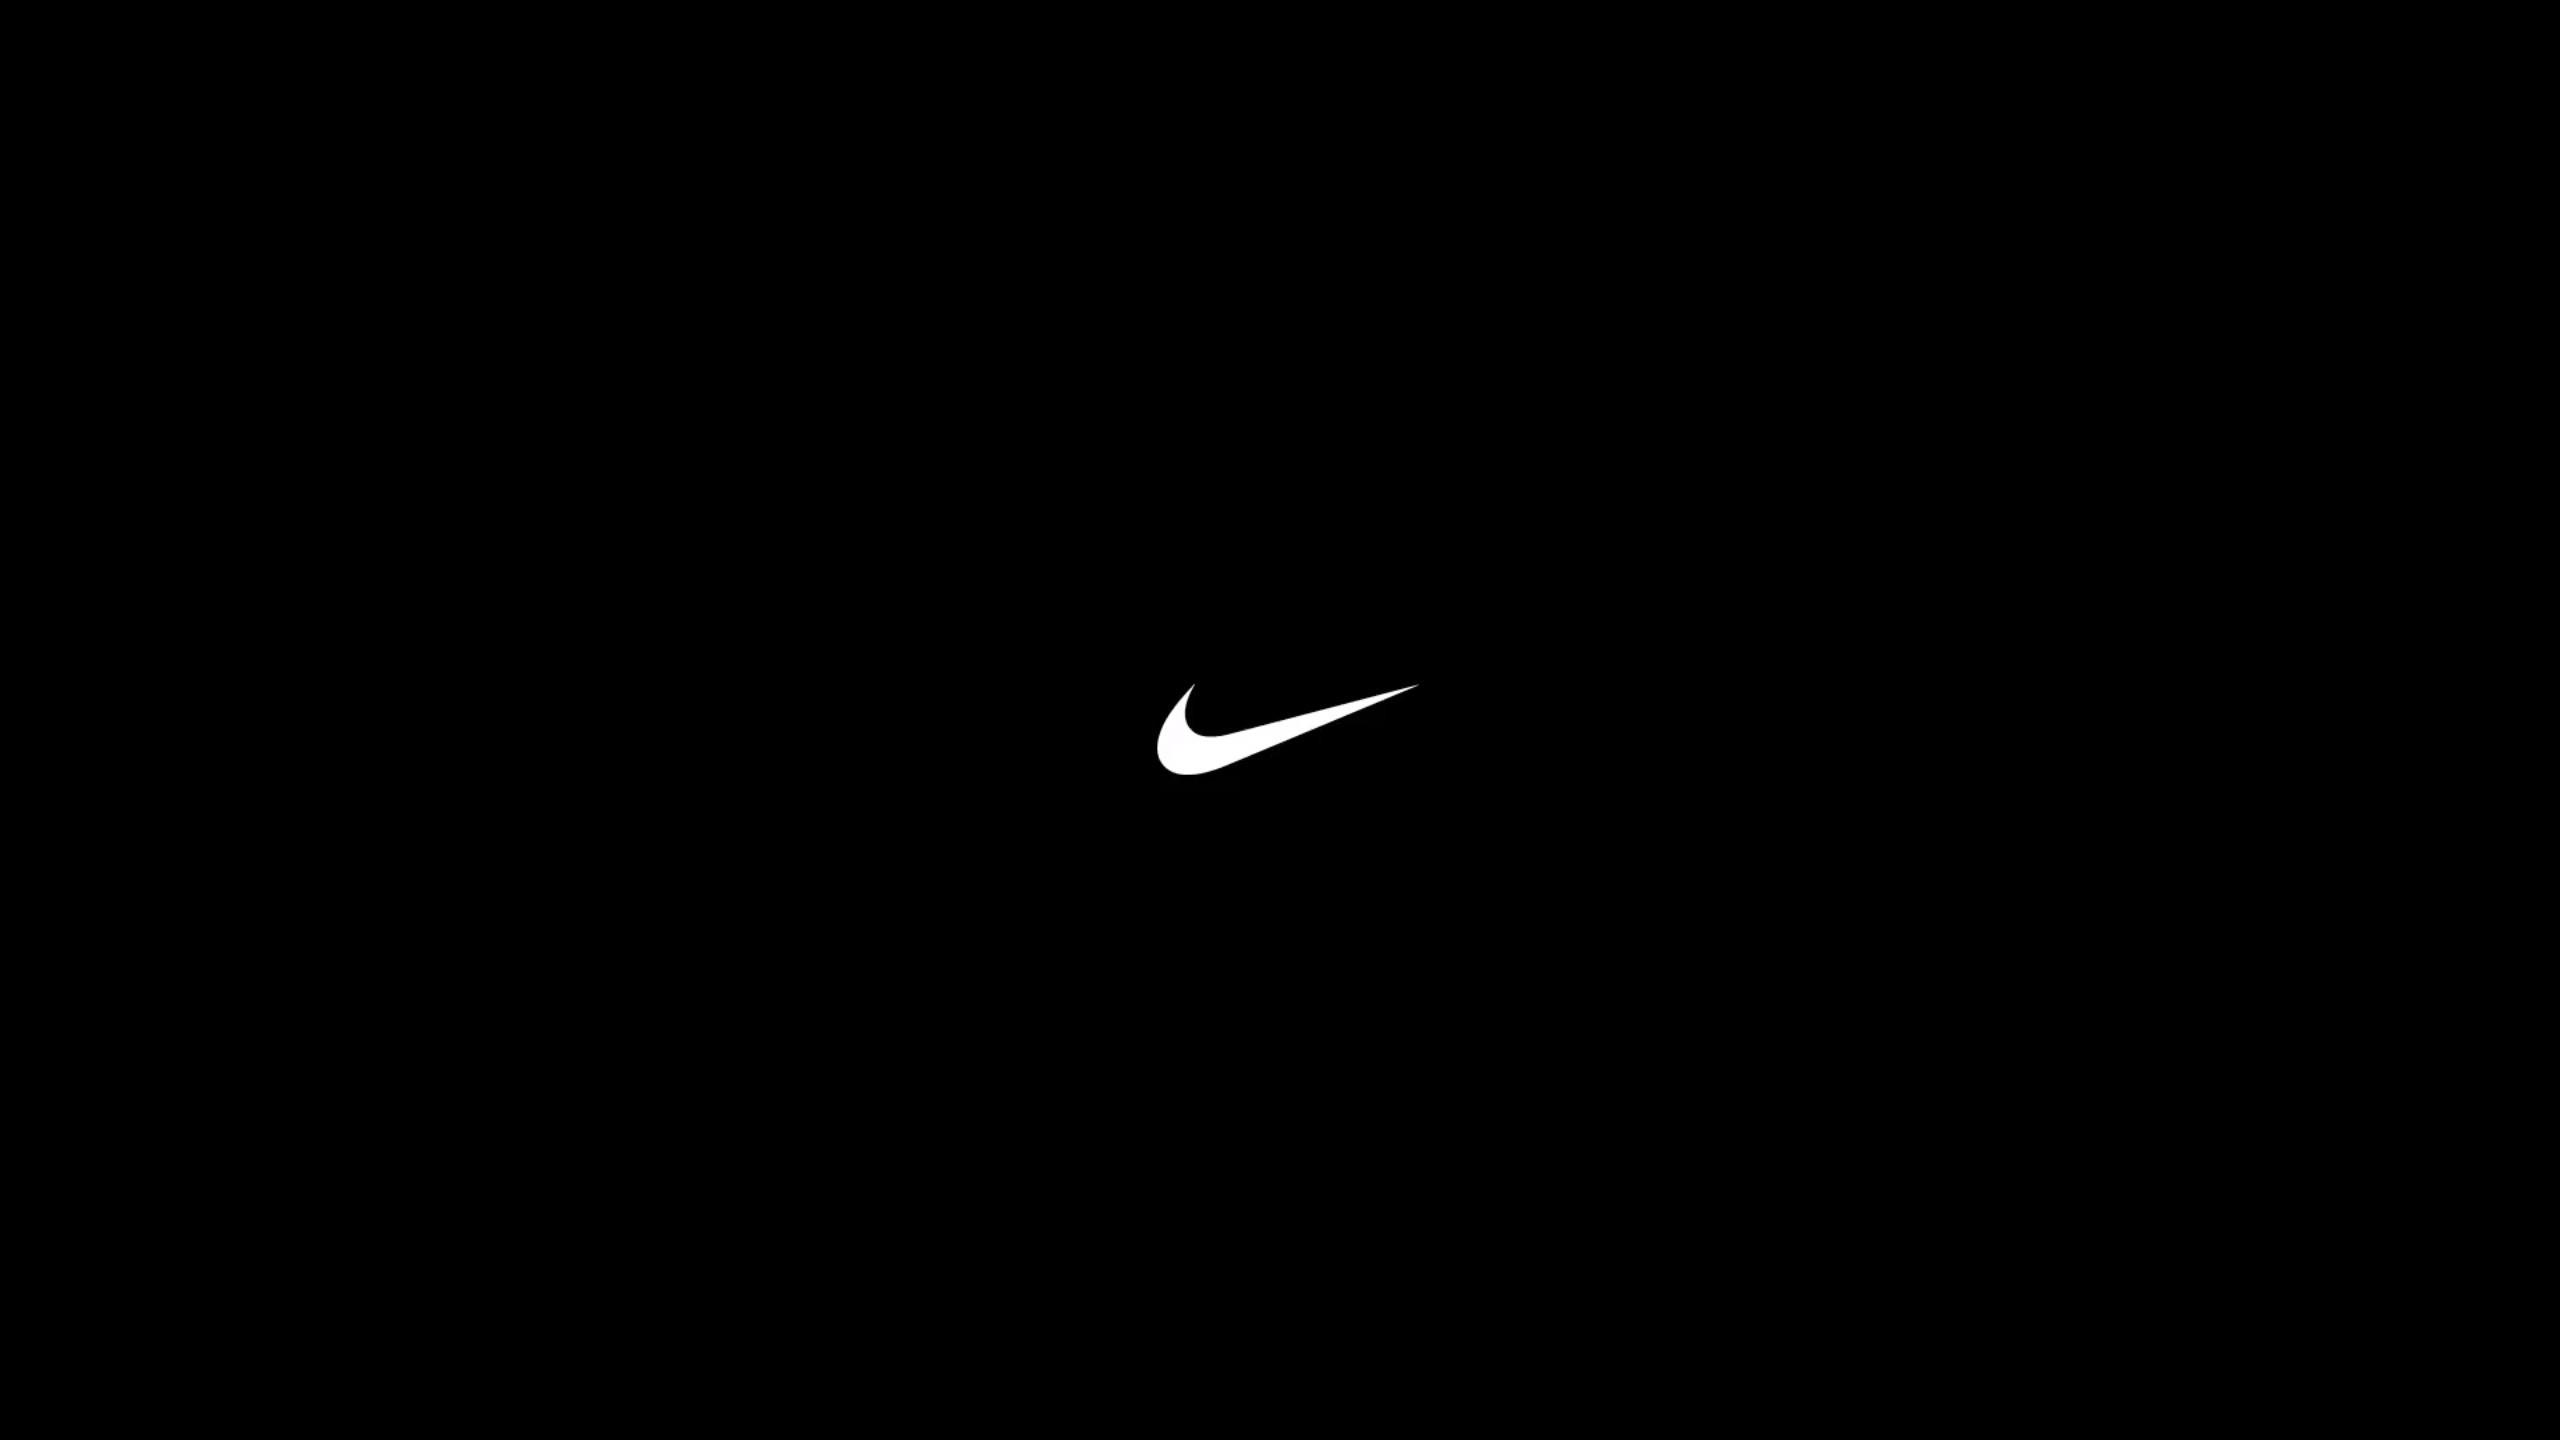 Nike swoosh wallpaper 56 images 1920x1080 nike tick wallpaper images biocorpaavc